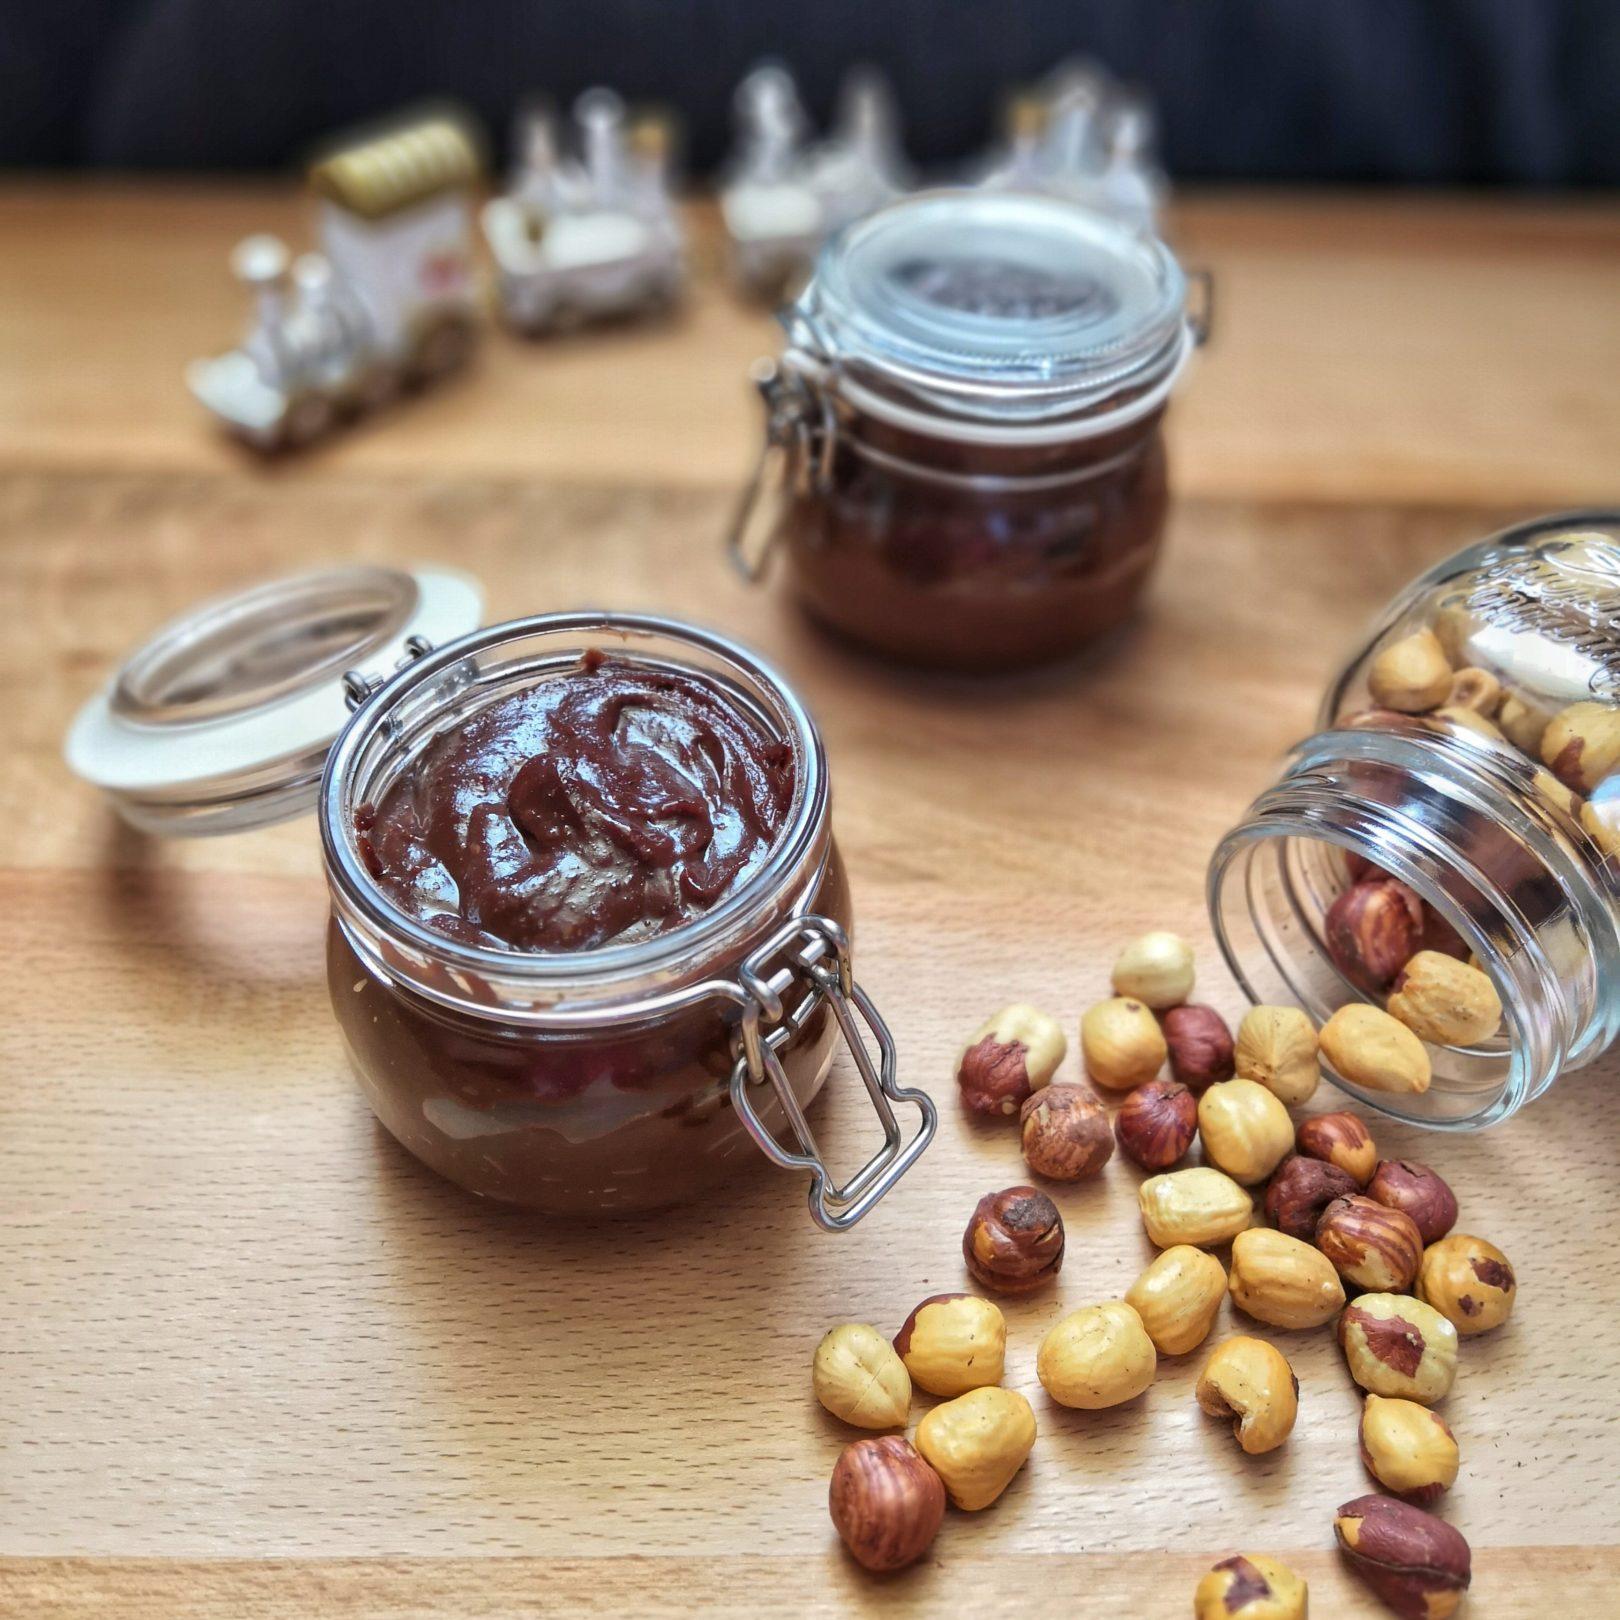 Keto Beginner's Nutella – Low-Carb Hazelnut Spread